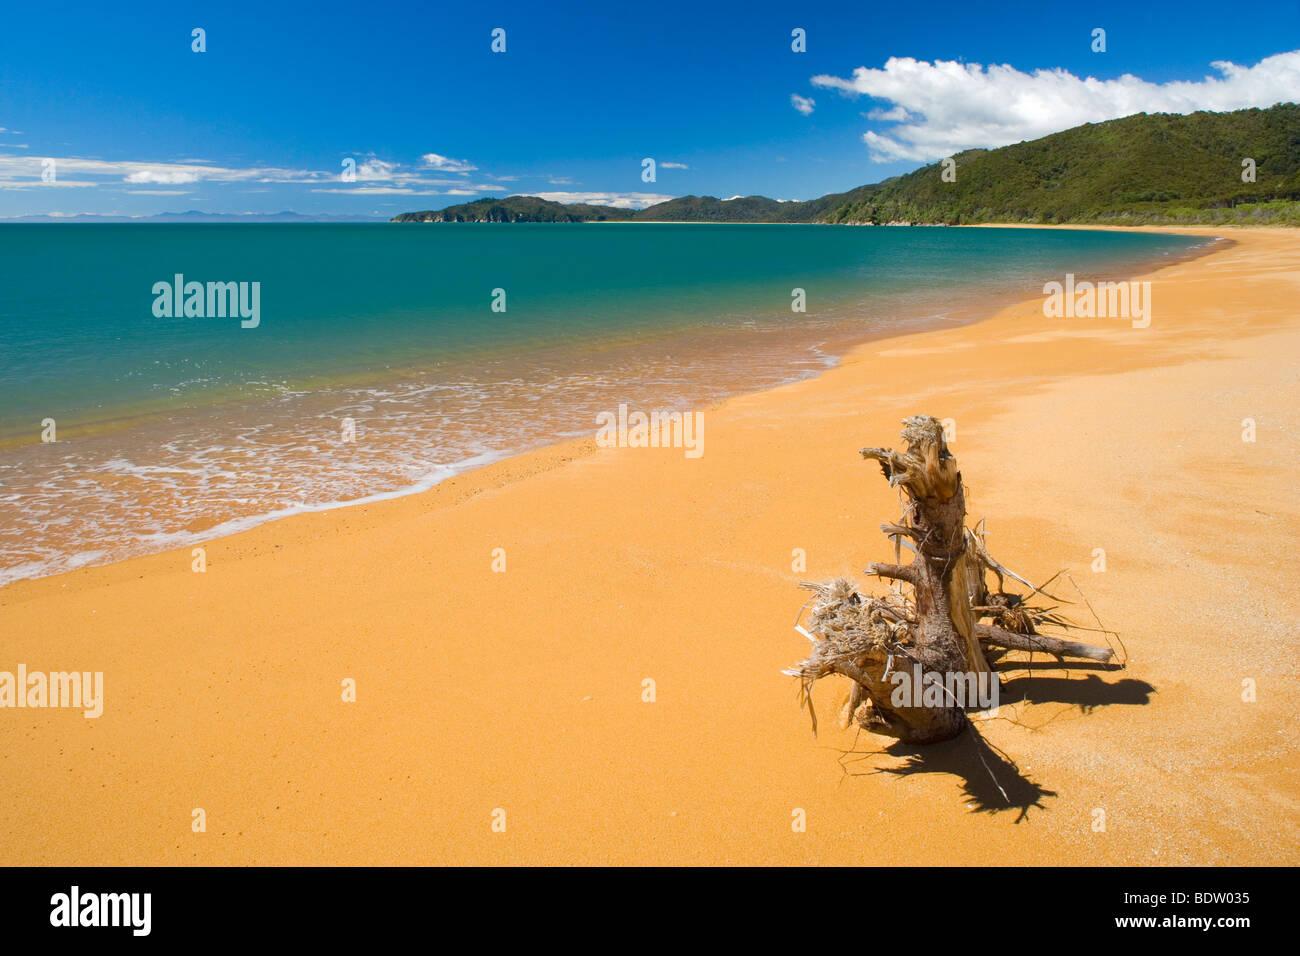 Golden beach of Totaranui and the blue ocean, Tasman District, South Island, New Zealand Stock Photo